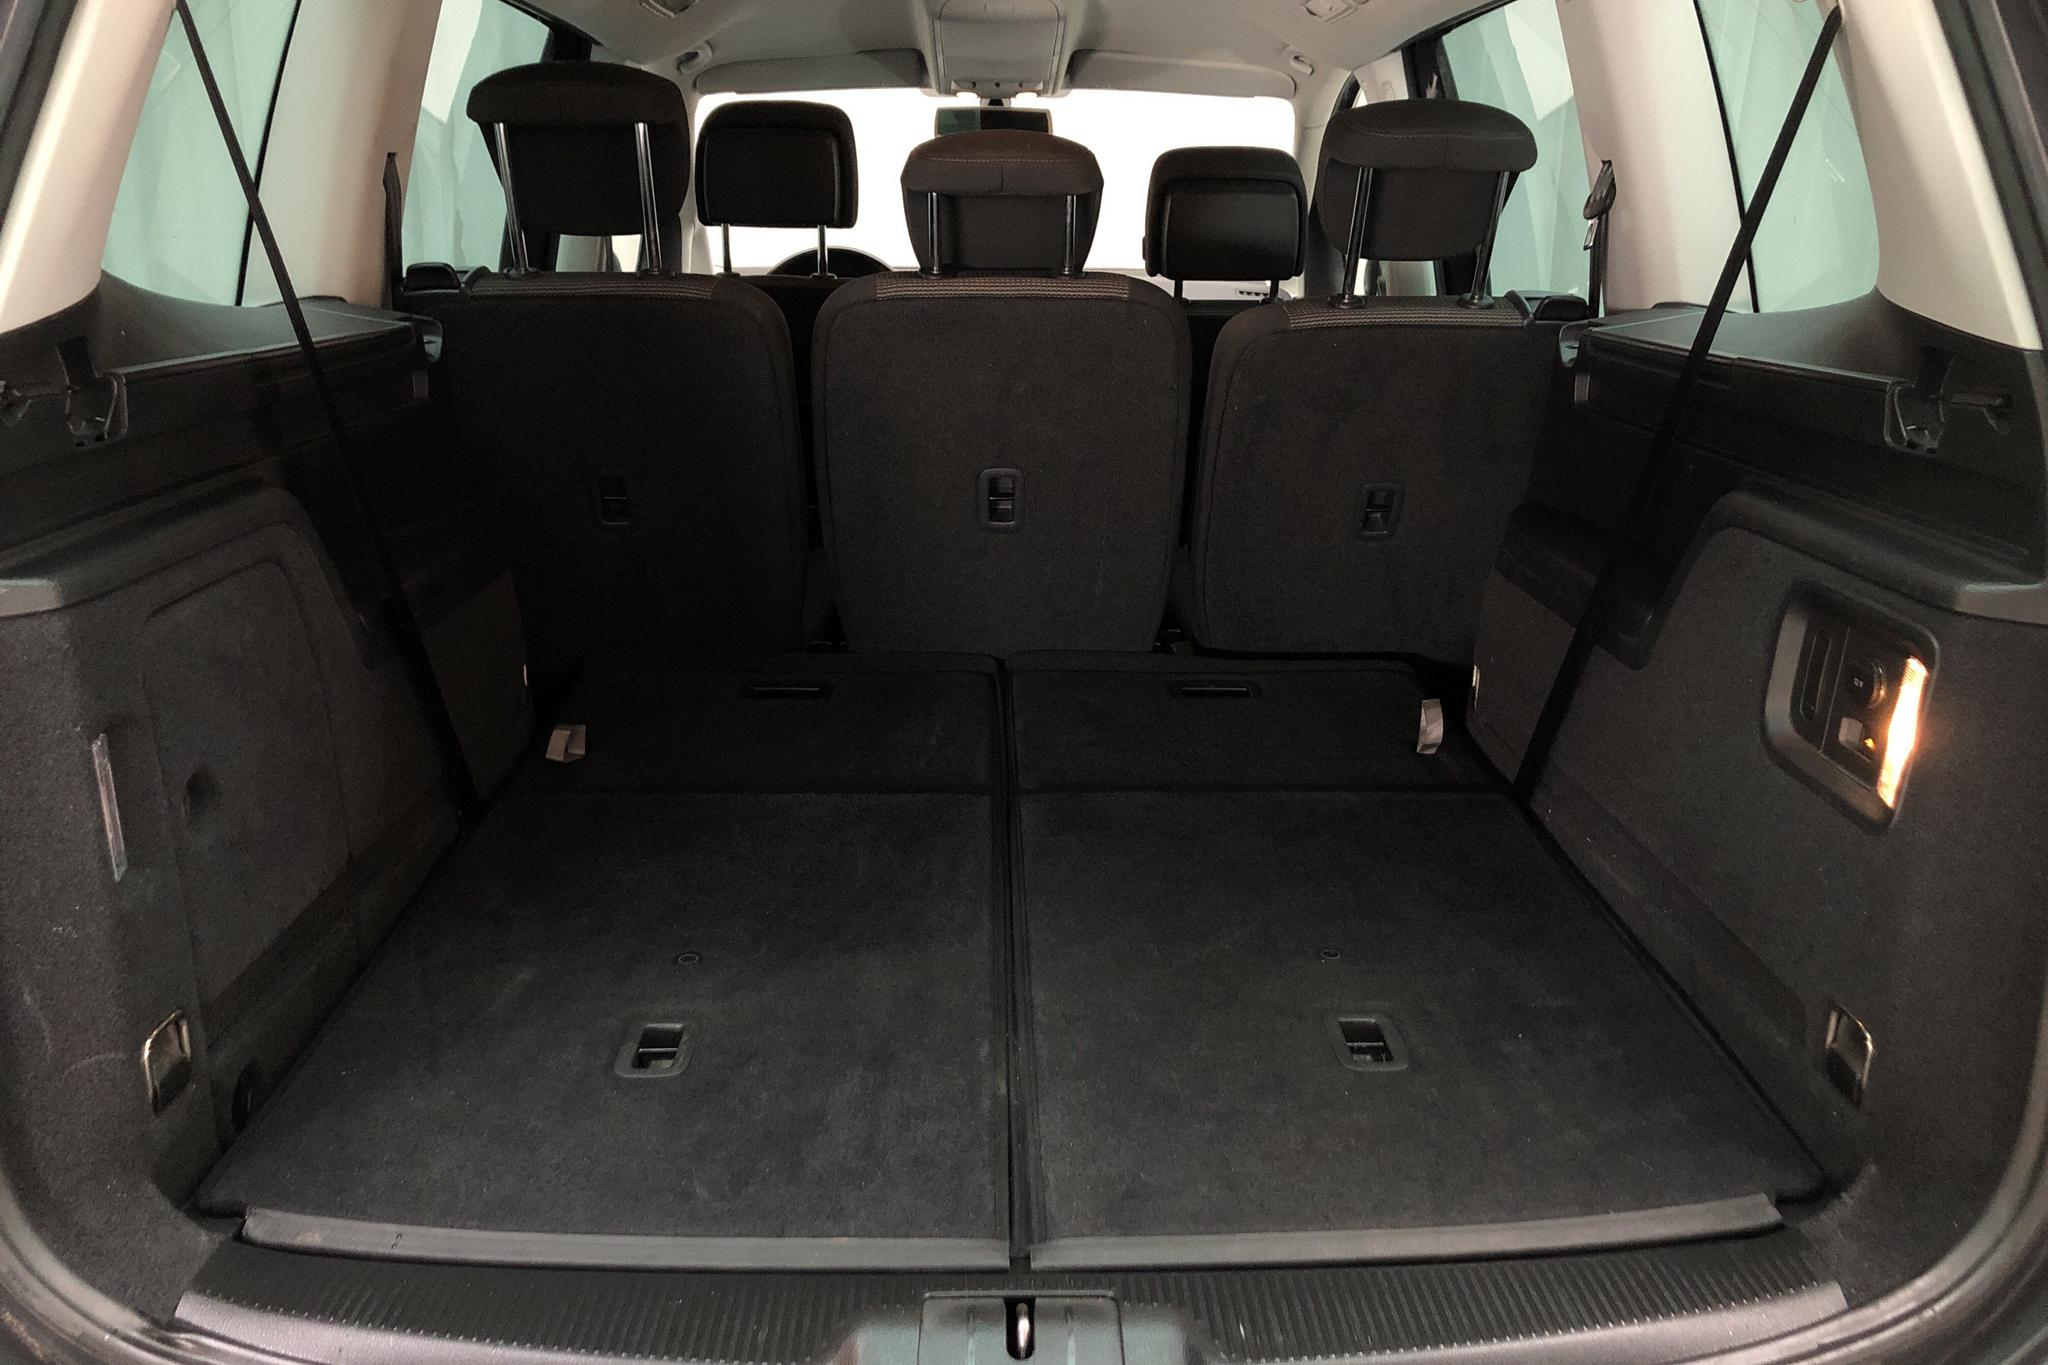 VW Sharan 2.0 TDI BlueMotion Technology (140hk) - 16 007 mil - Automat - Dark Grey - 2014